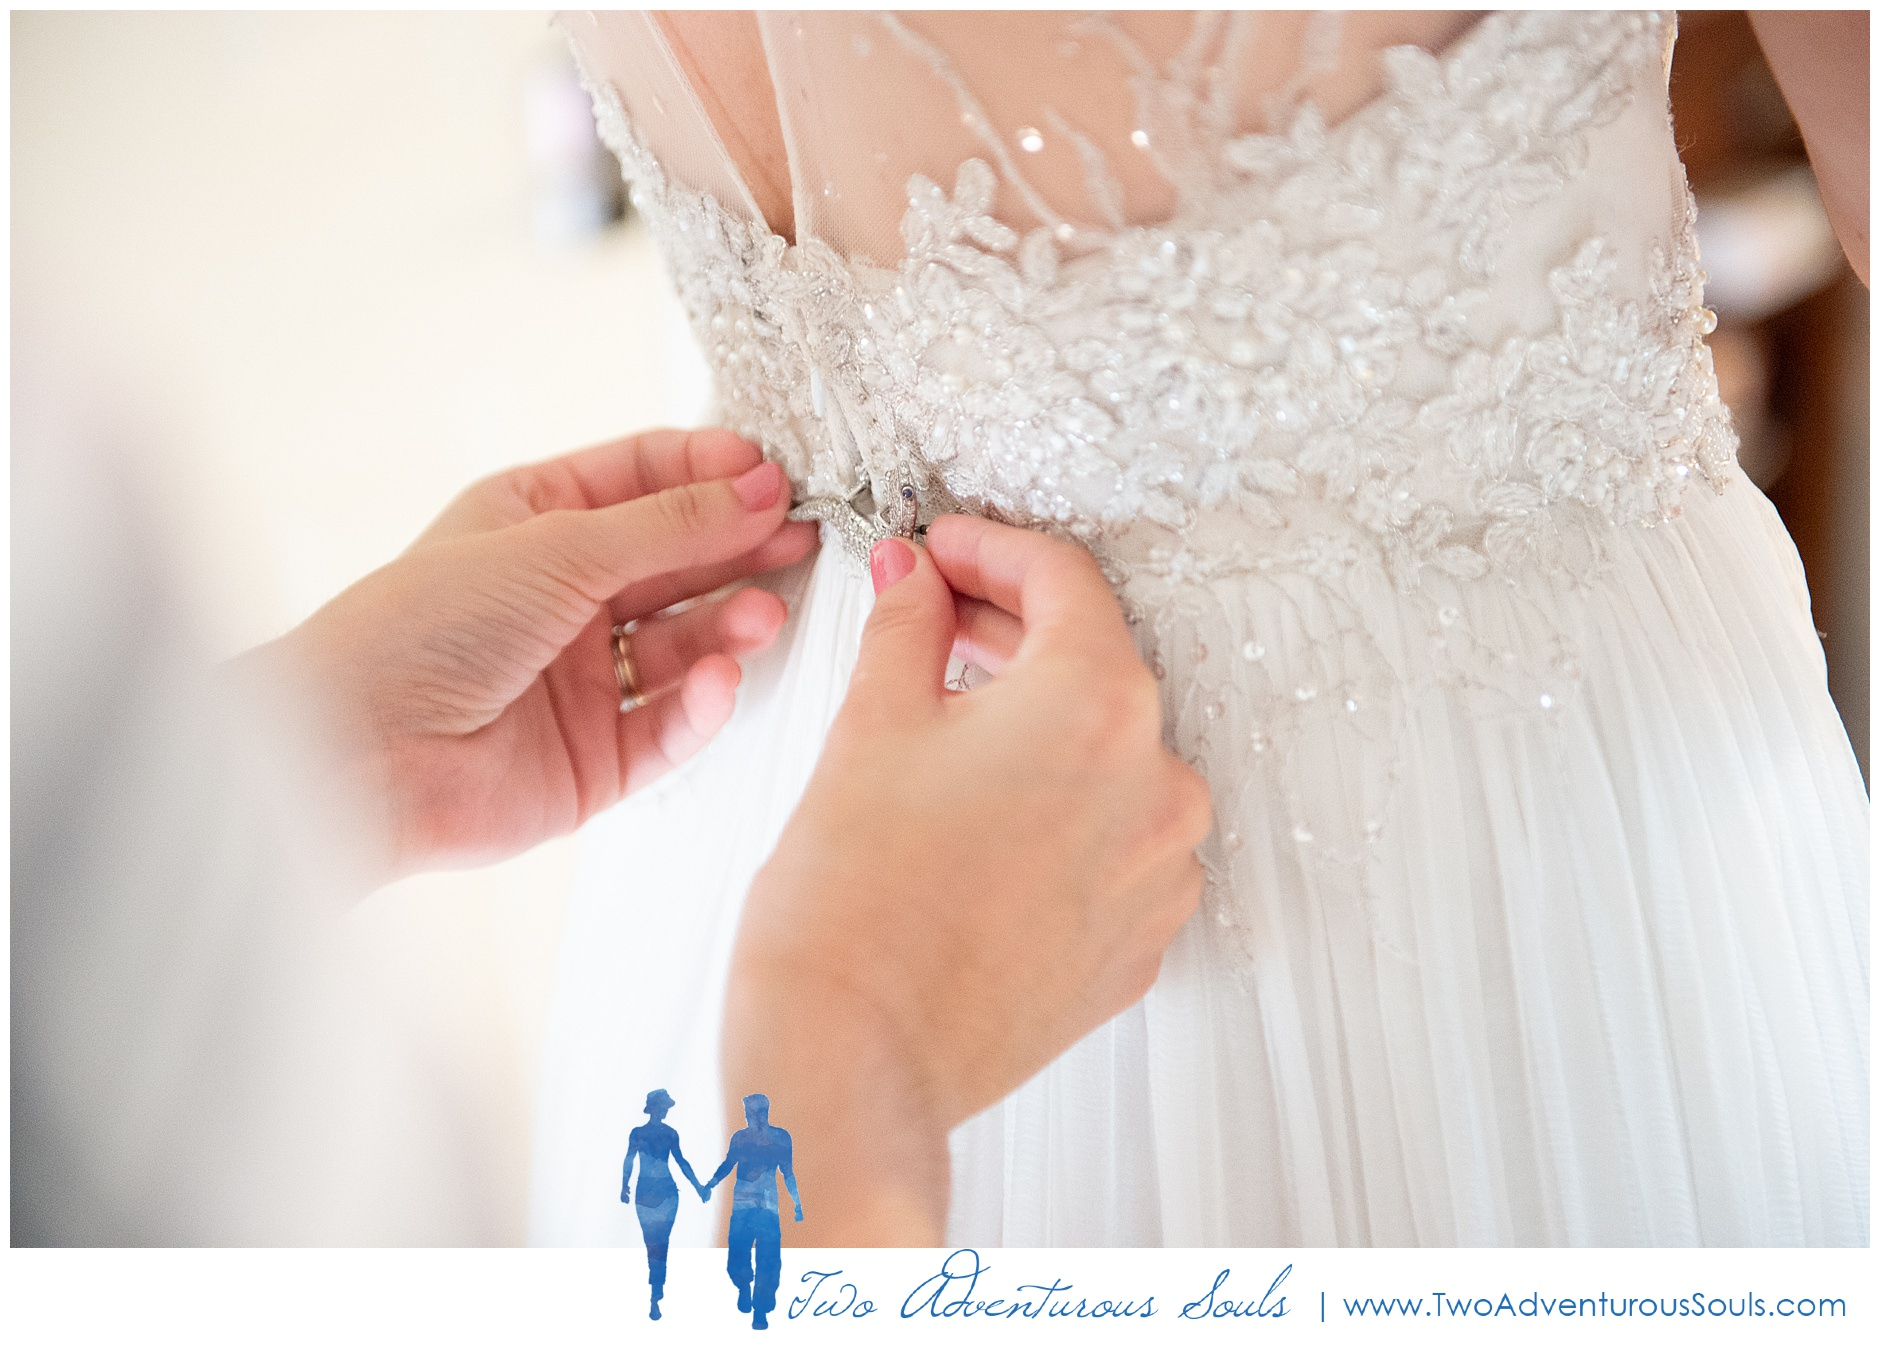 Grace Maine Photographers, Portland Maine Wedding Photographers, Two Adventurous Souls- 090719_0003.jpg